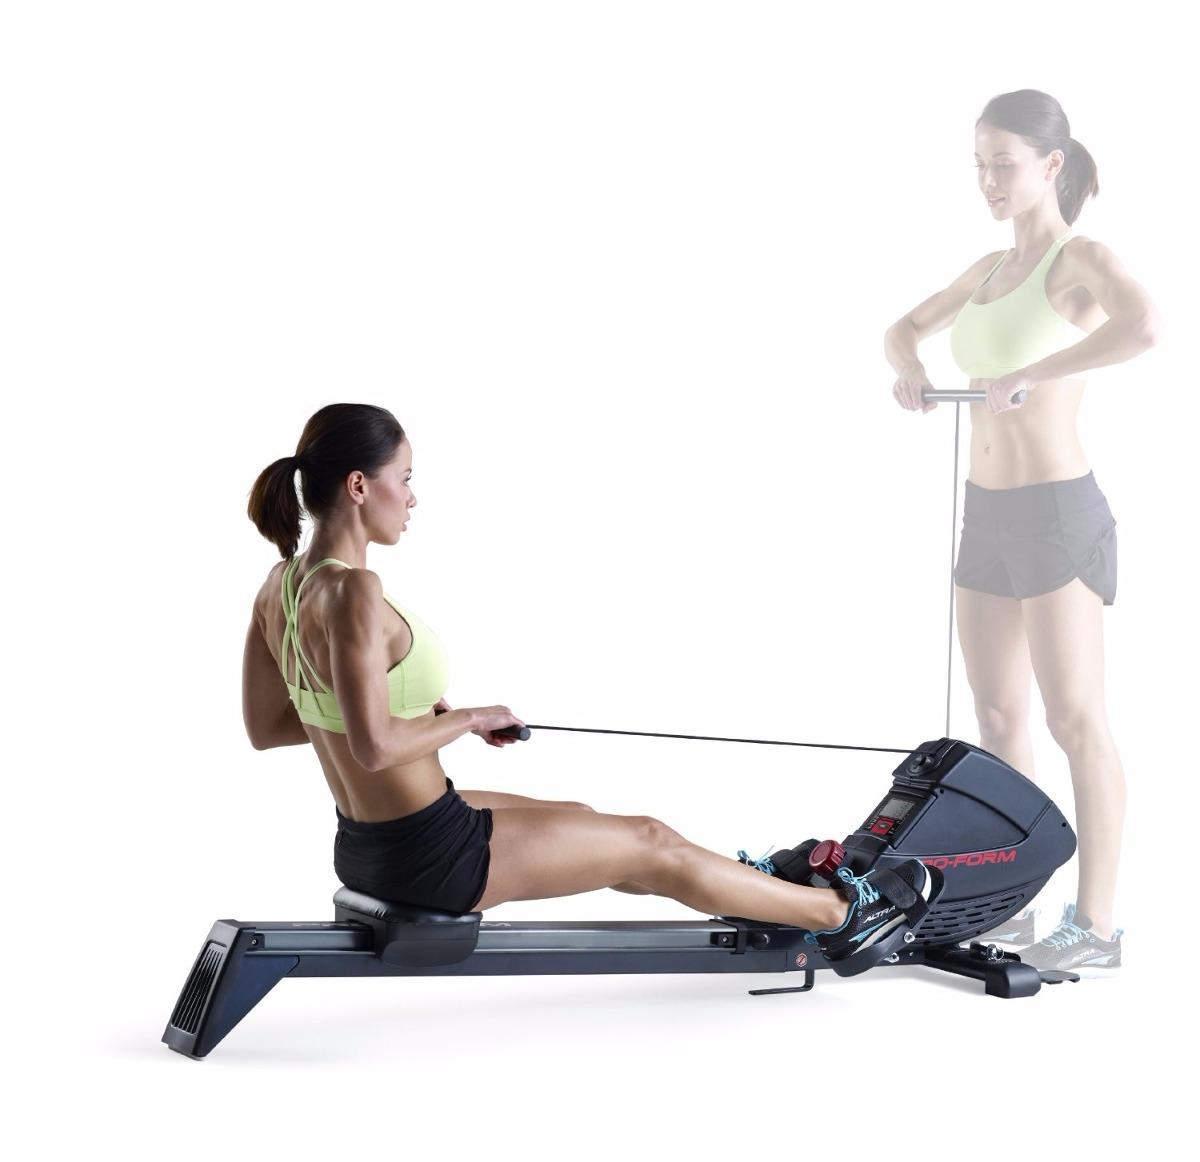 Remo remadora proform 440 r aparato maquina ejercicio gym for Aparatos de ejercicio